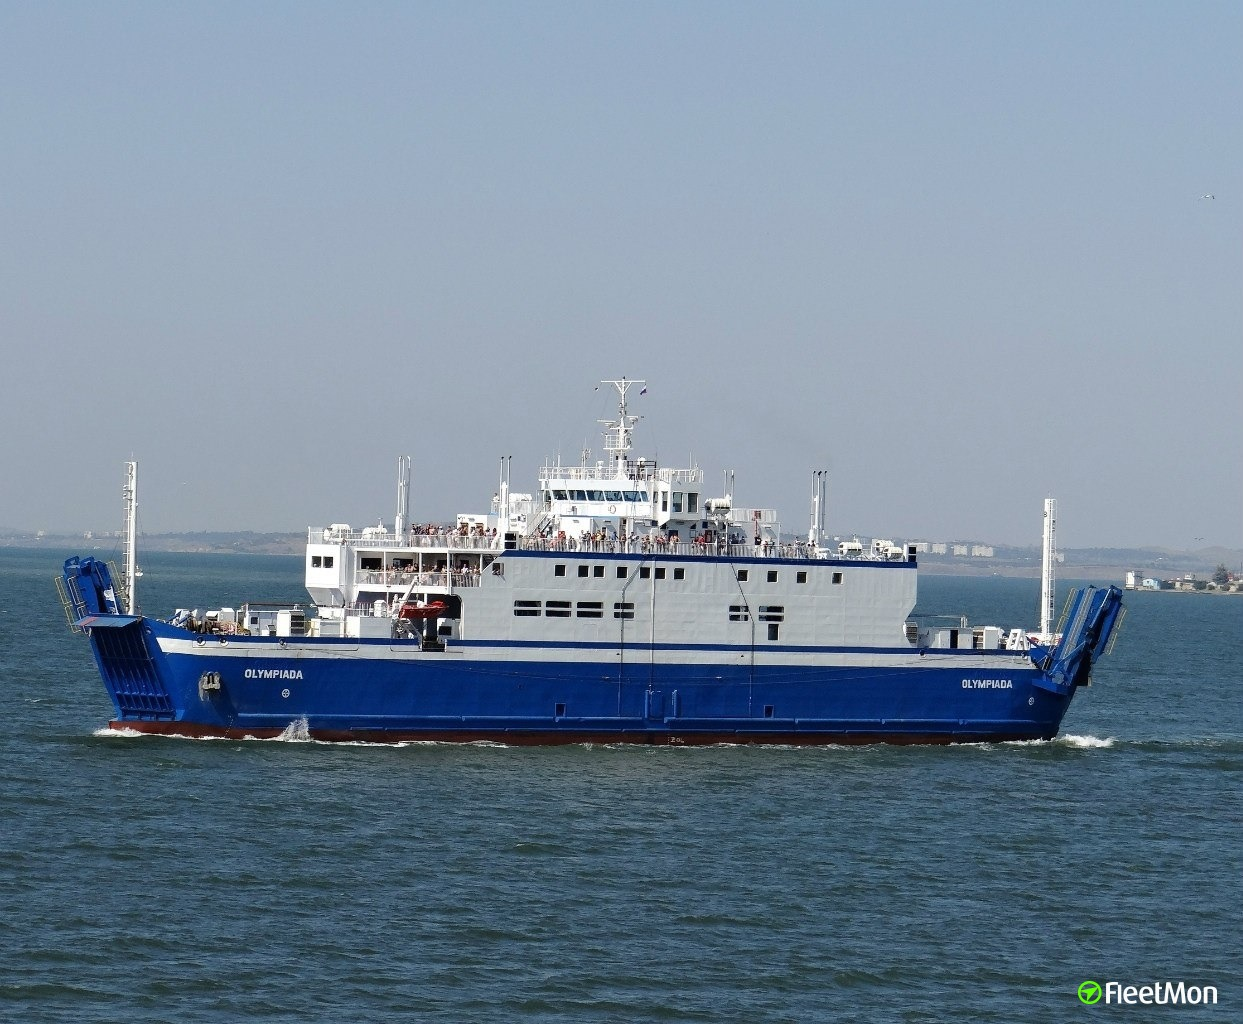 Ferry Olympiada allided with pier, Kerch, Crimea